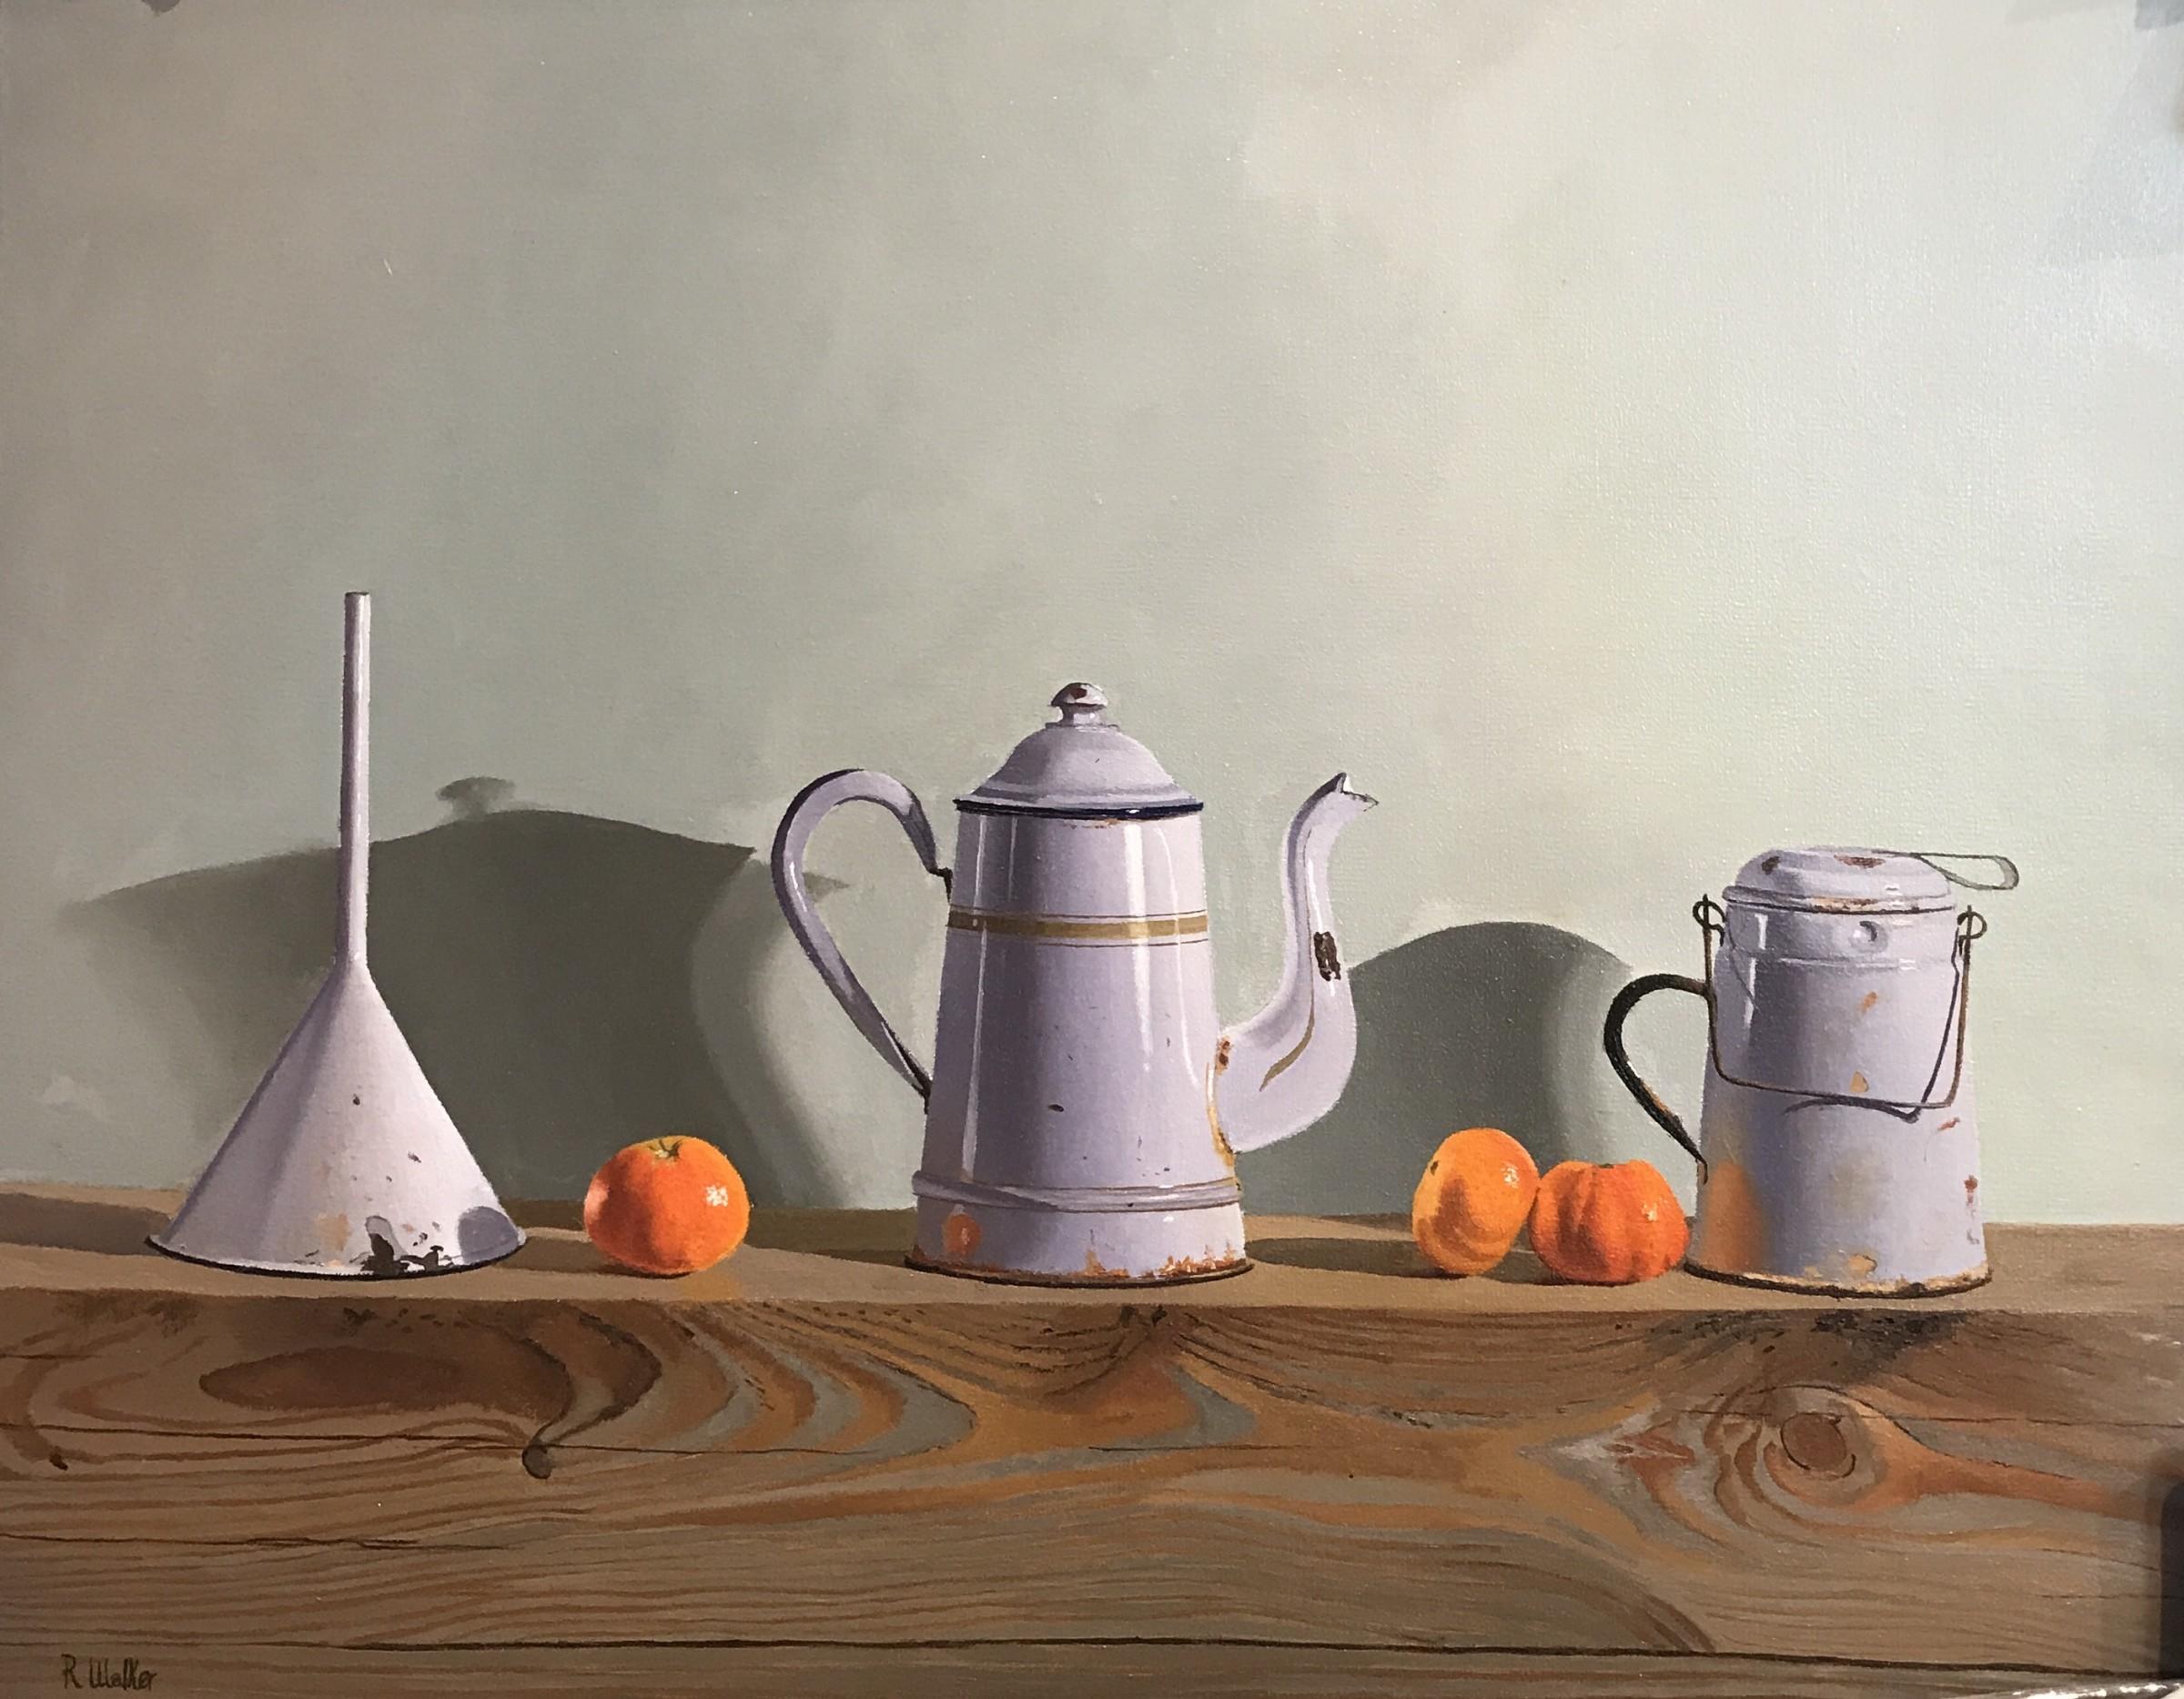 <span class=&#34;link fancybox-details-link&#34;><a href=&#34;/artists/67-robert-walker/works/624-robert-walker-white-coffee-pot/&#34;>View Detail Page</a></span><div class=&#34;artist&#34;><strong>Robert Walker</strong></div> <div class=&#34;title&#34;><em>White Coffee Pot</em></div> <div class=&#34;medium&#34;>Oil on Linen <br /> </div> <div class=&#34;dimensions&#34;>42 x 52 cm</div>